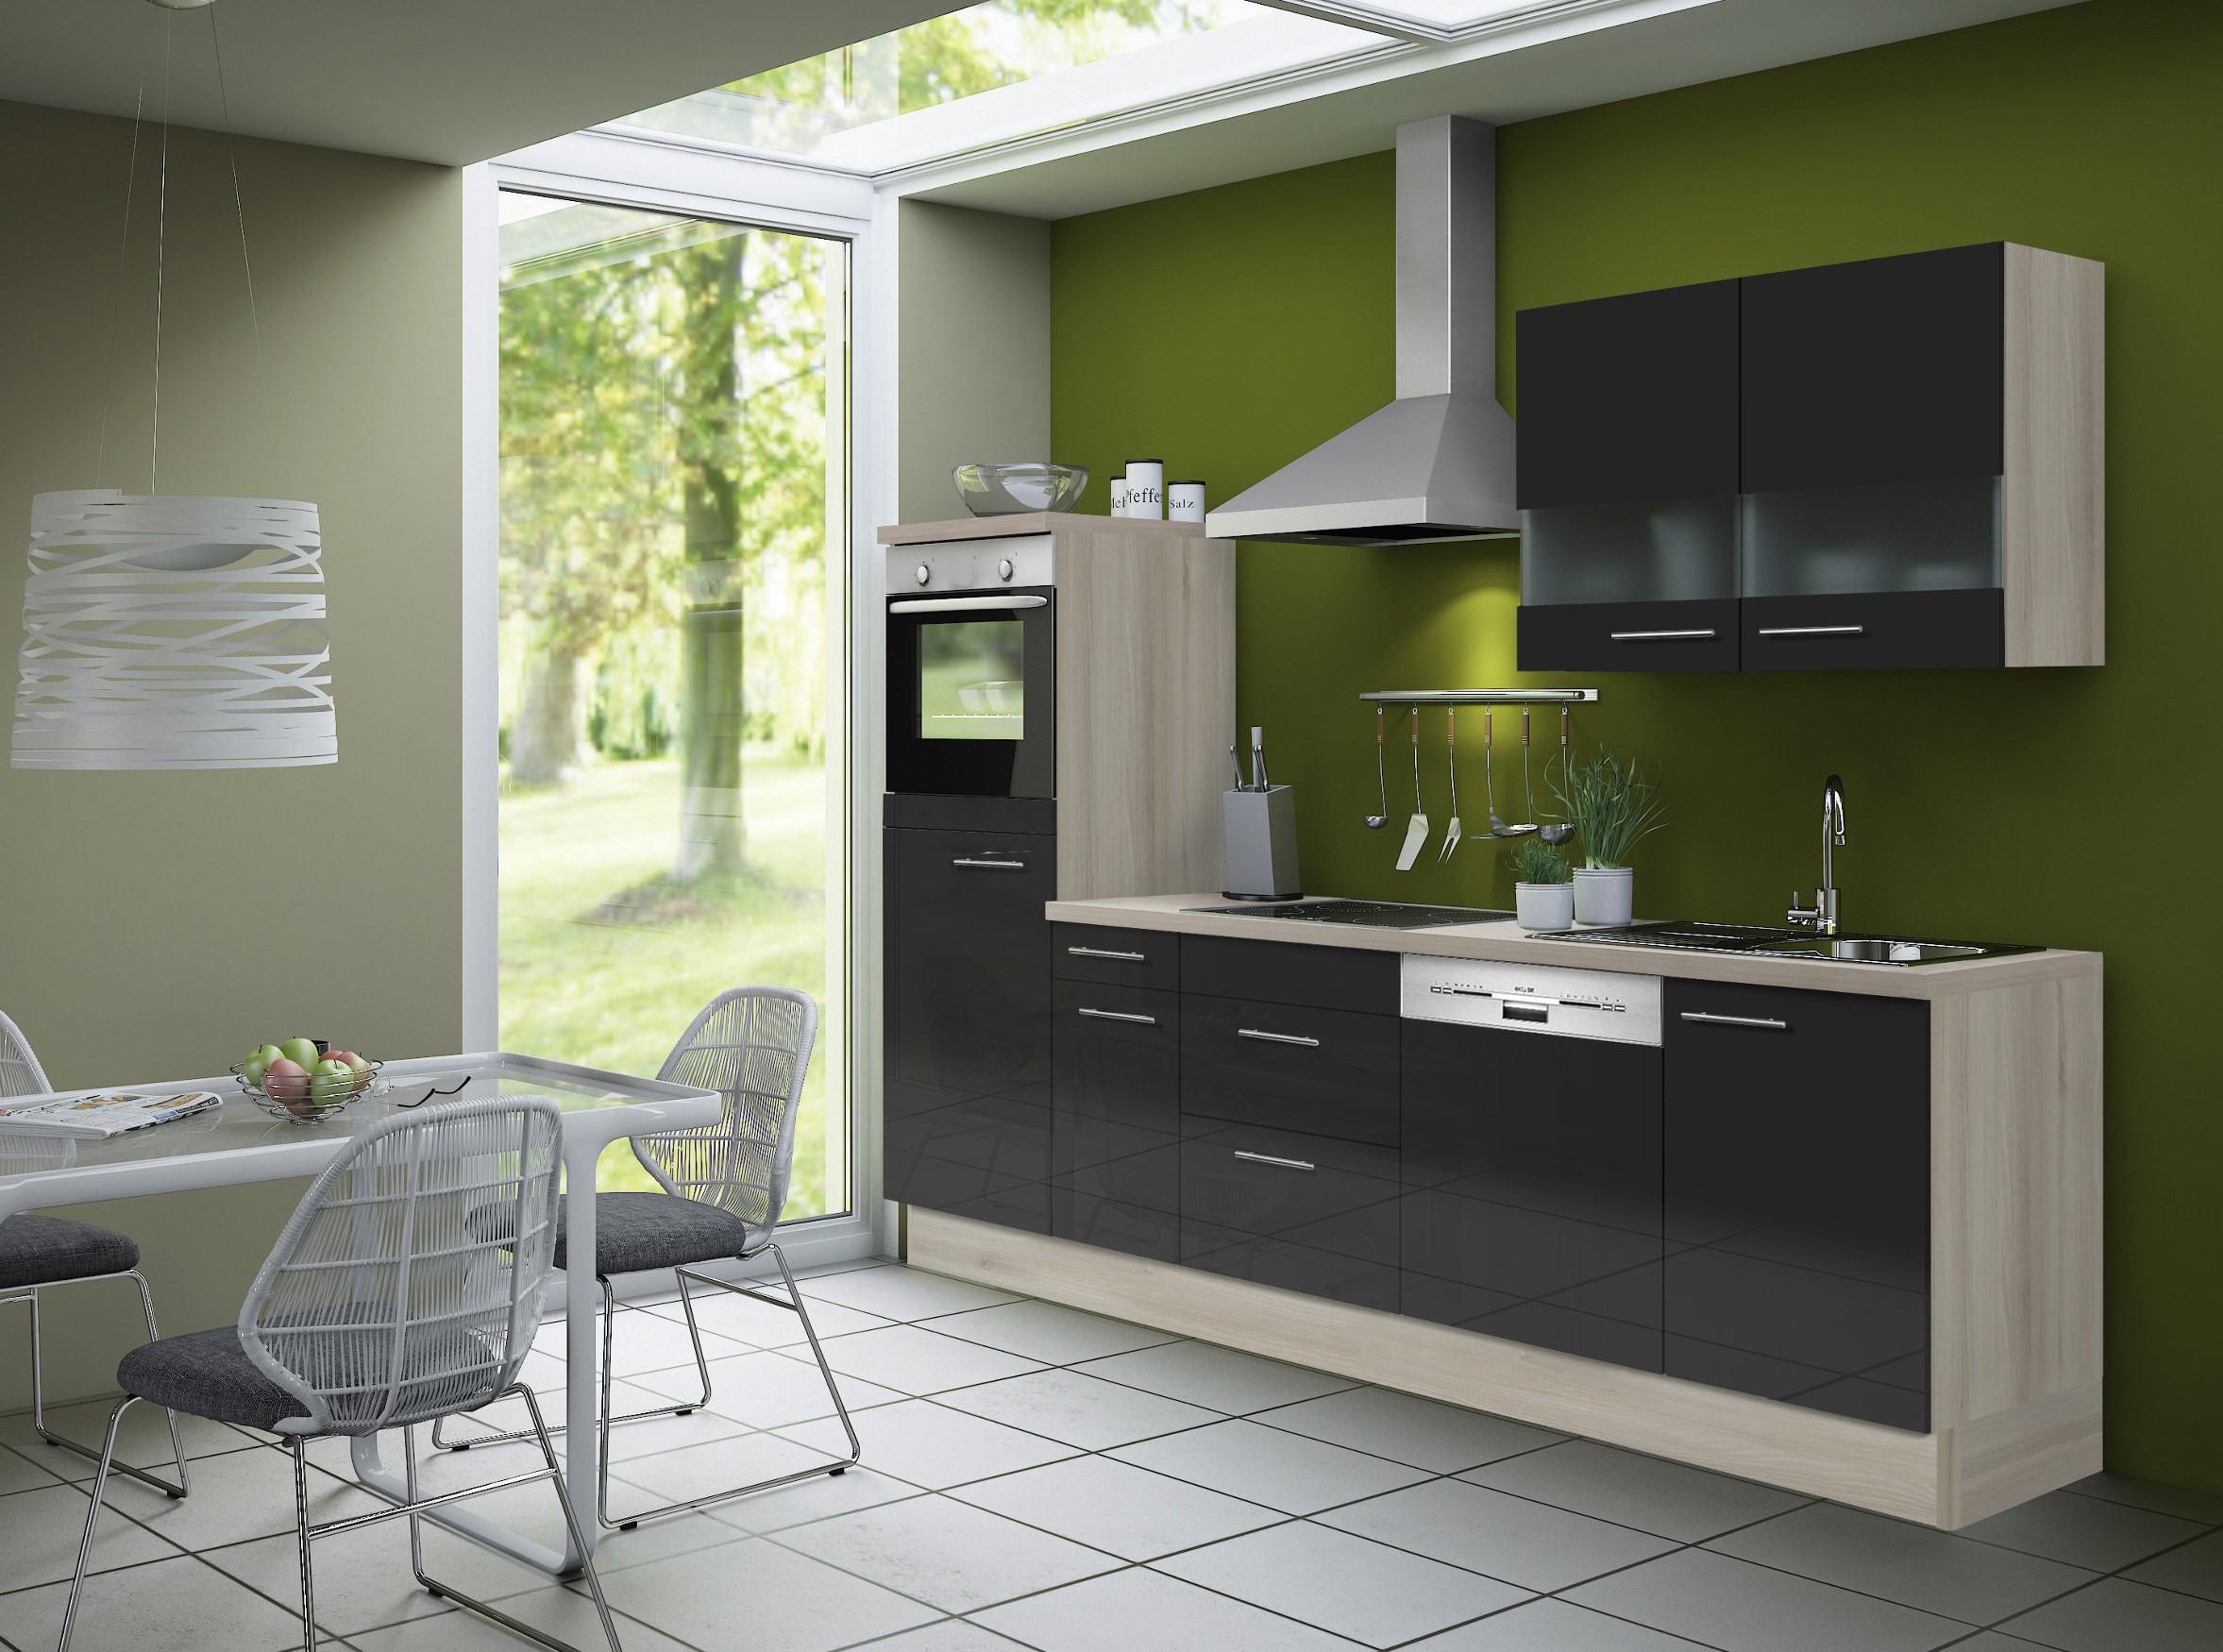 k chenzeile leon vario 5 k che mit e ger ten breite. Black Bedroom Furniture Sets. Home Design Ideas